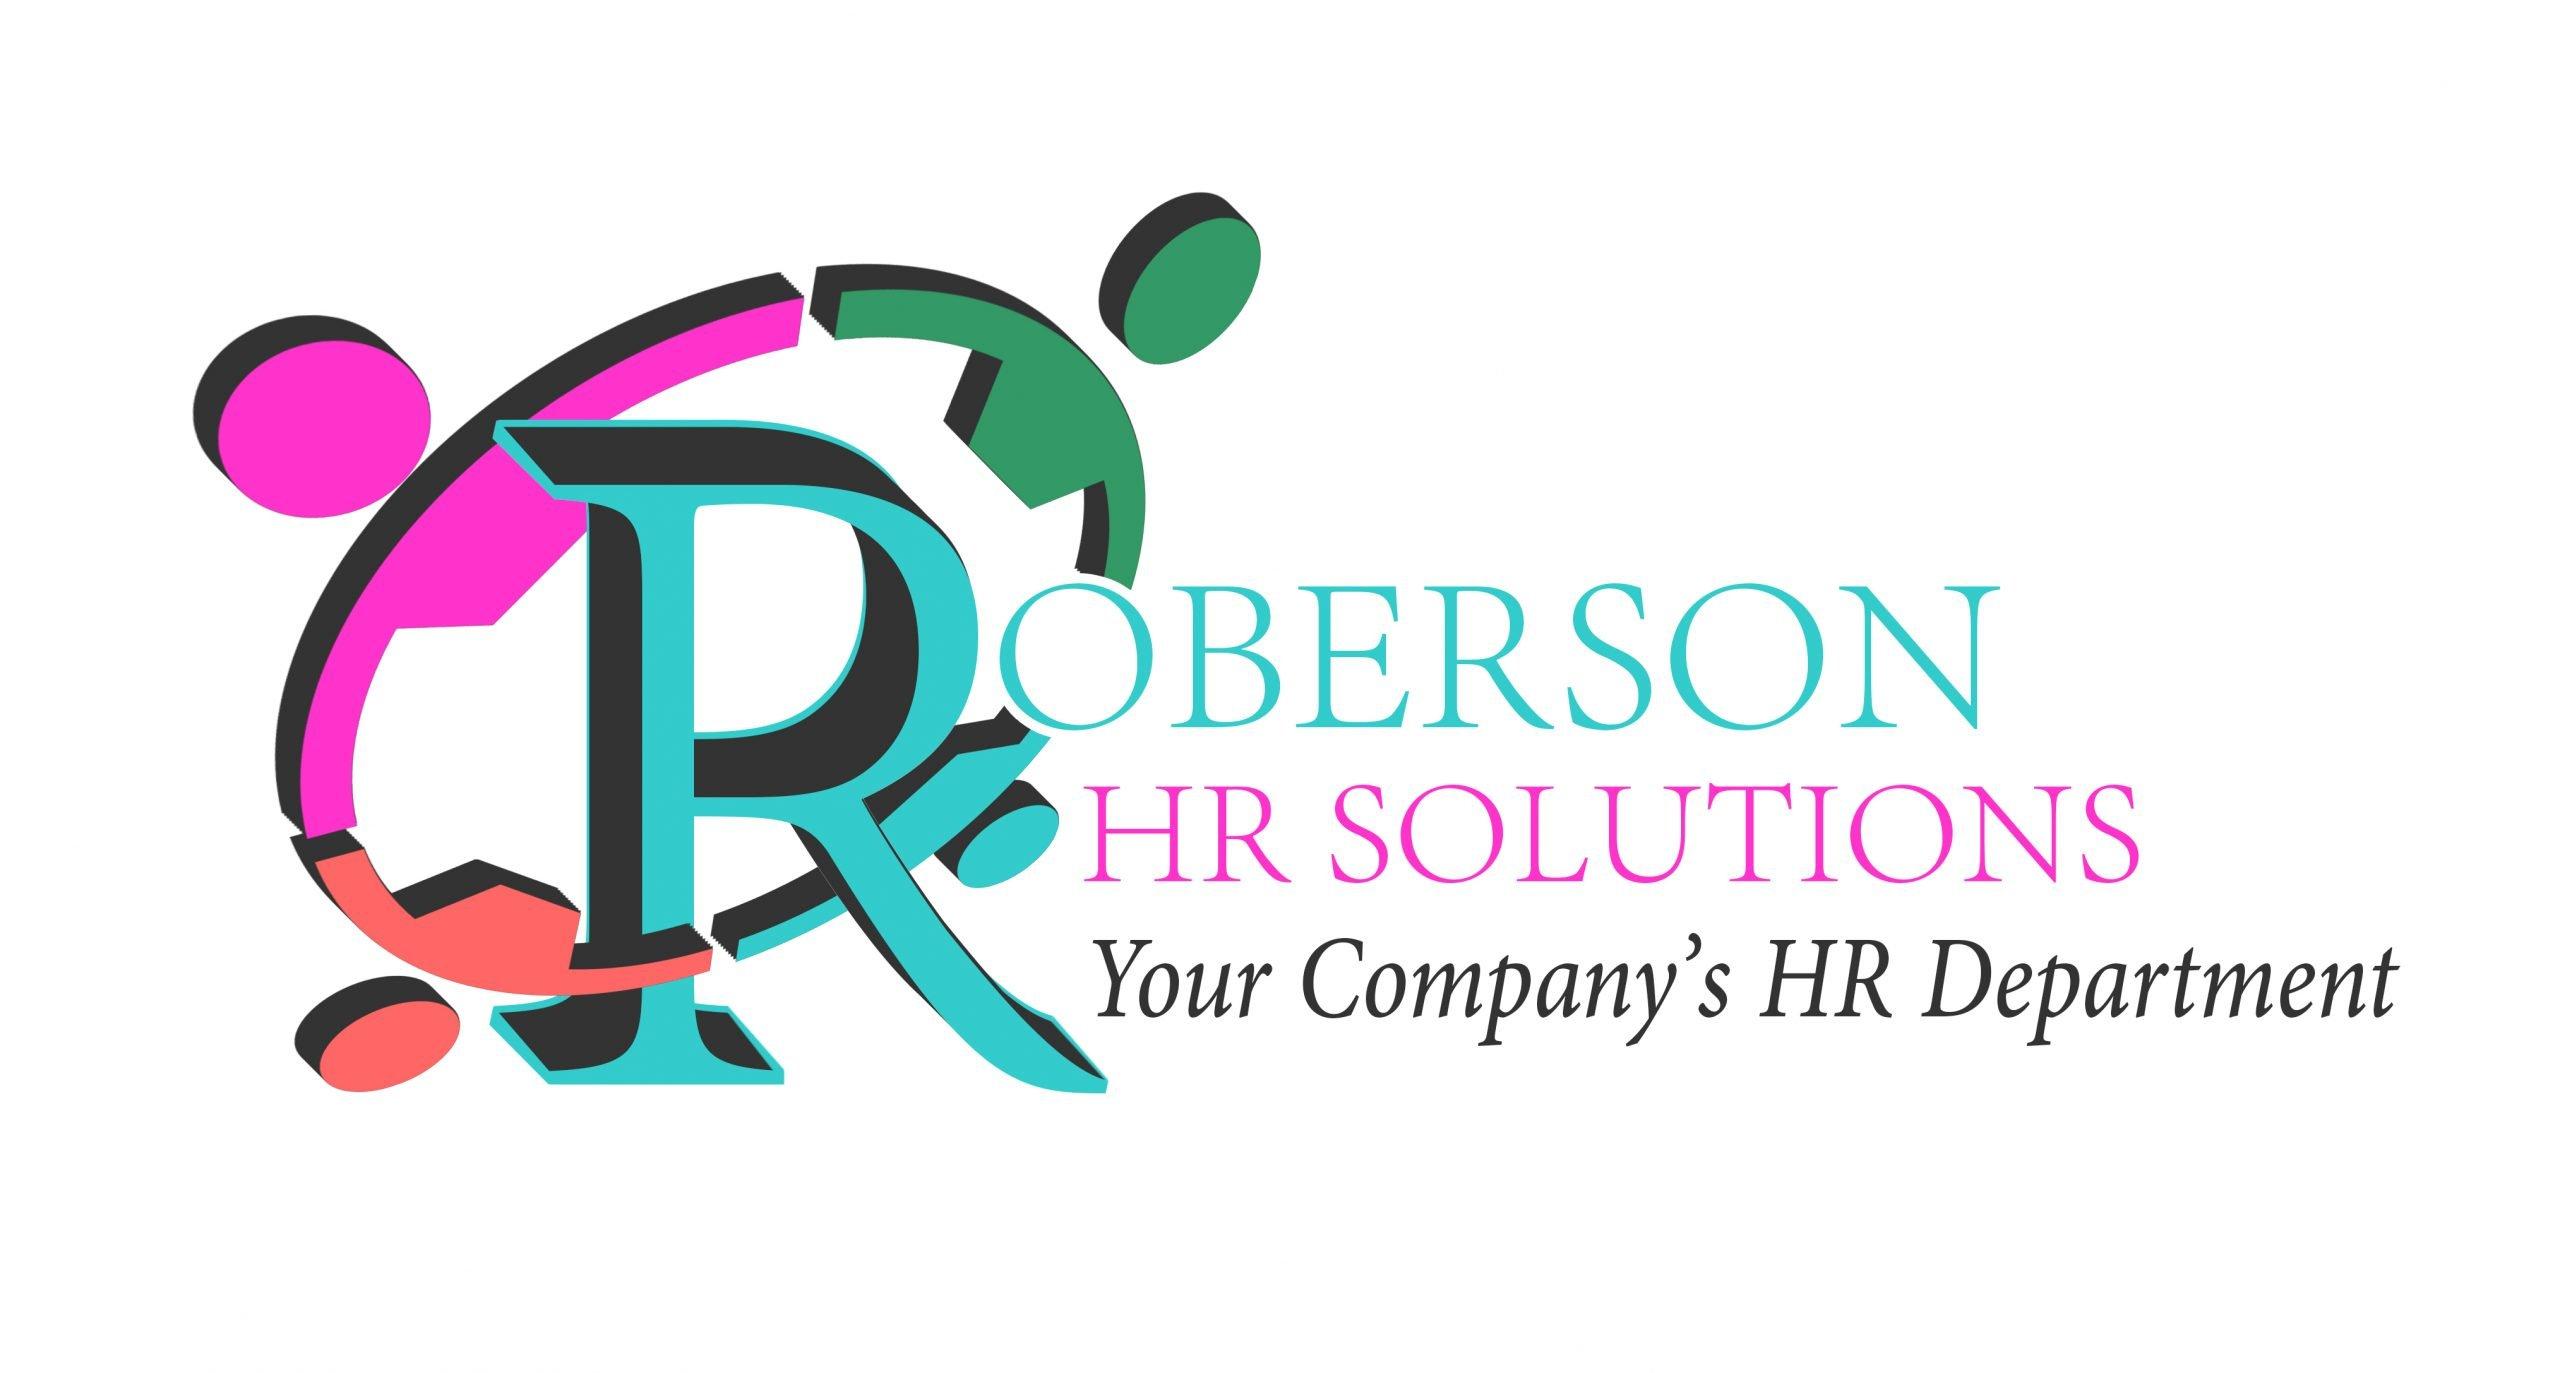 Human Resources Company Logo Design